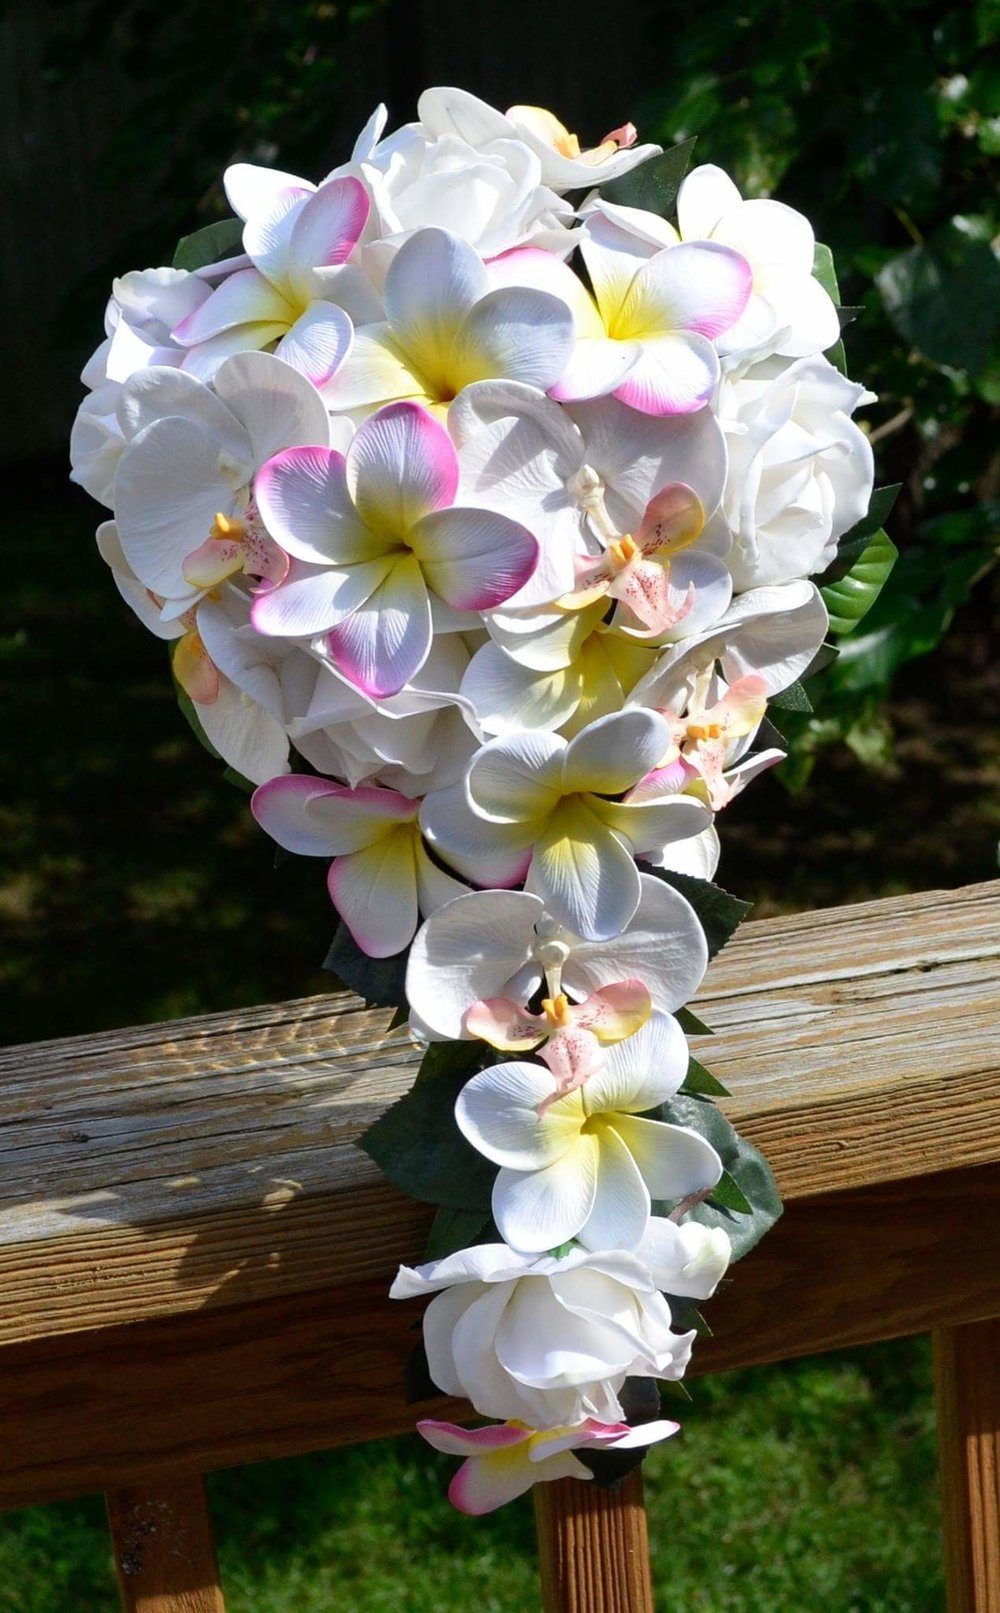 Why Clients Choose Silk Flower Arrangements From Team Flower